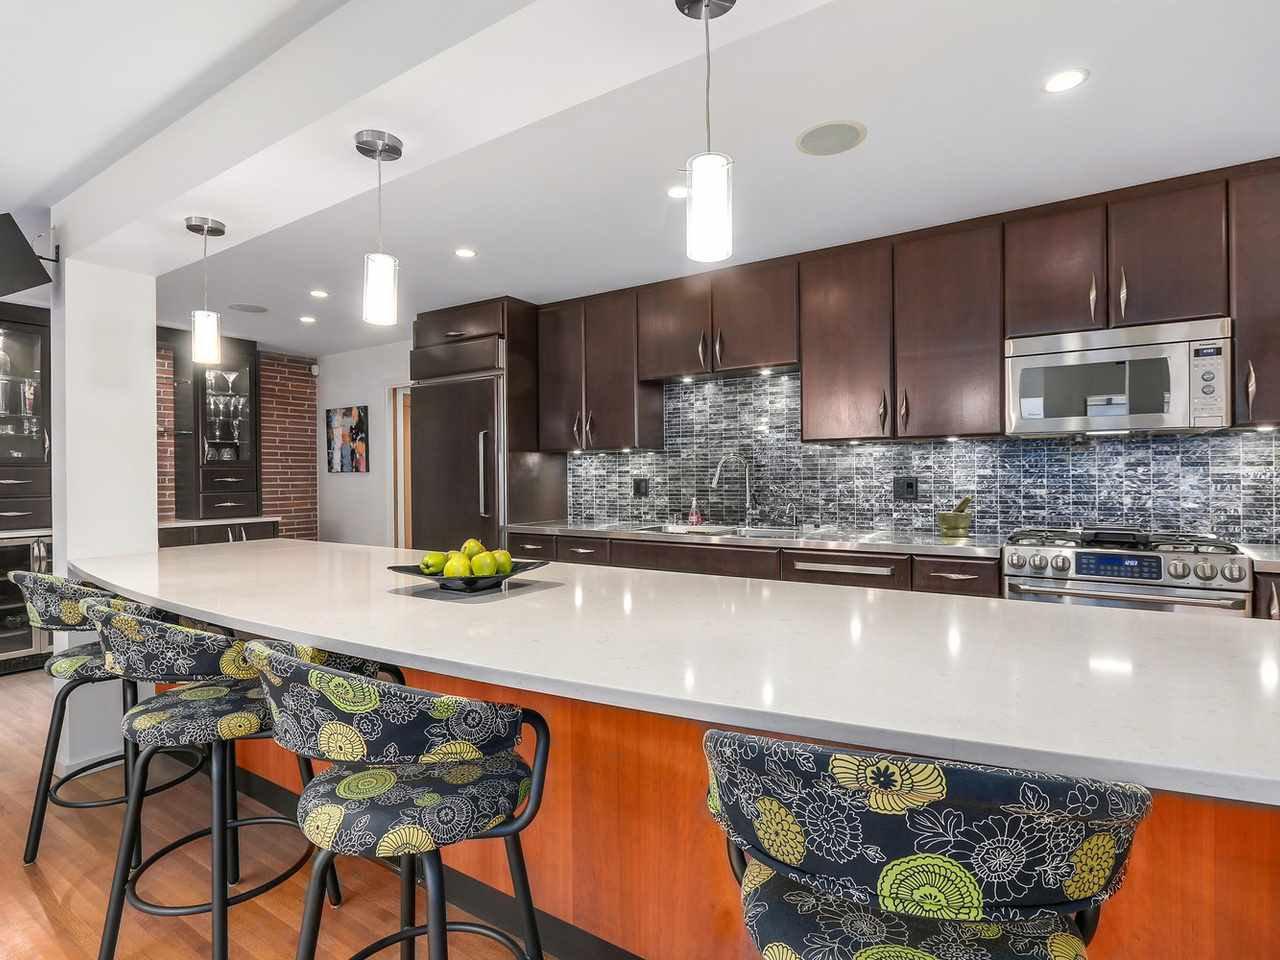 Photo 10: Photos: 3708 EDGEMONT Boulevard in North Vancouver: Edgemont House Fourplex for sale : MLS®# R2138514